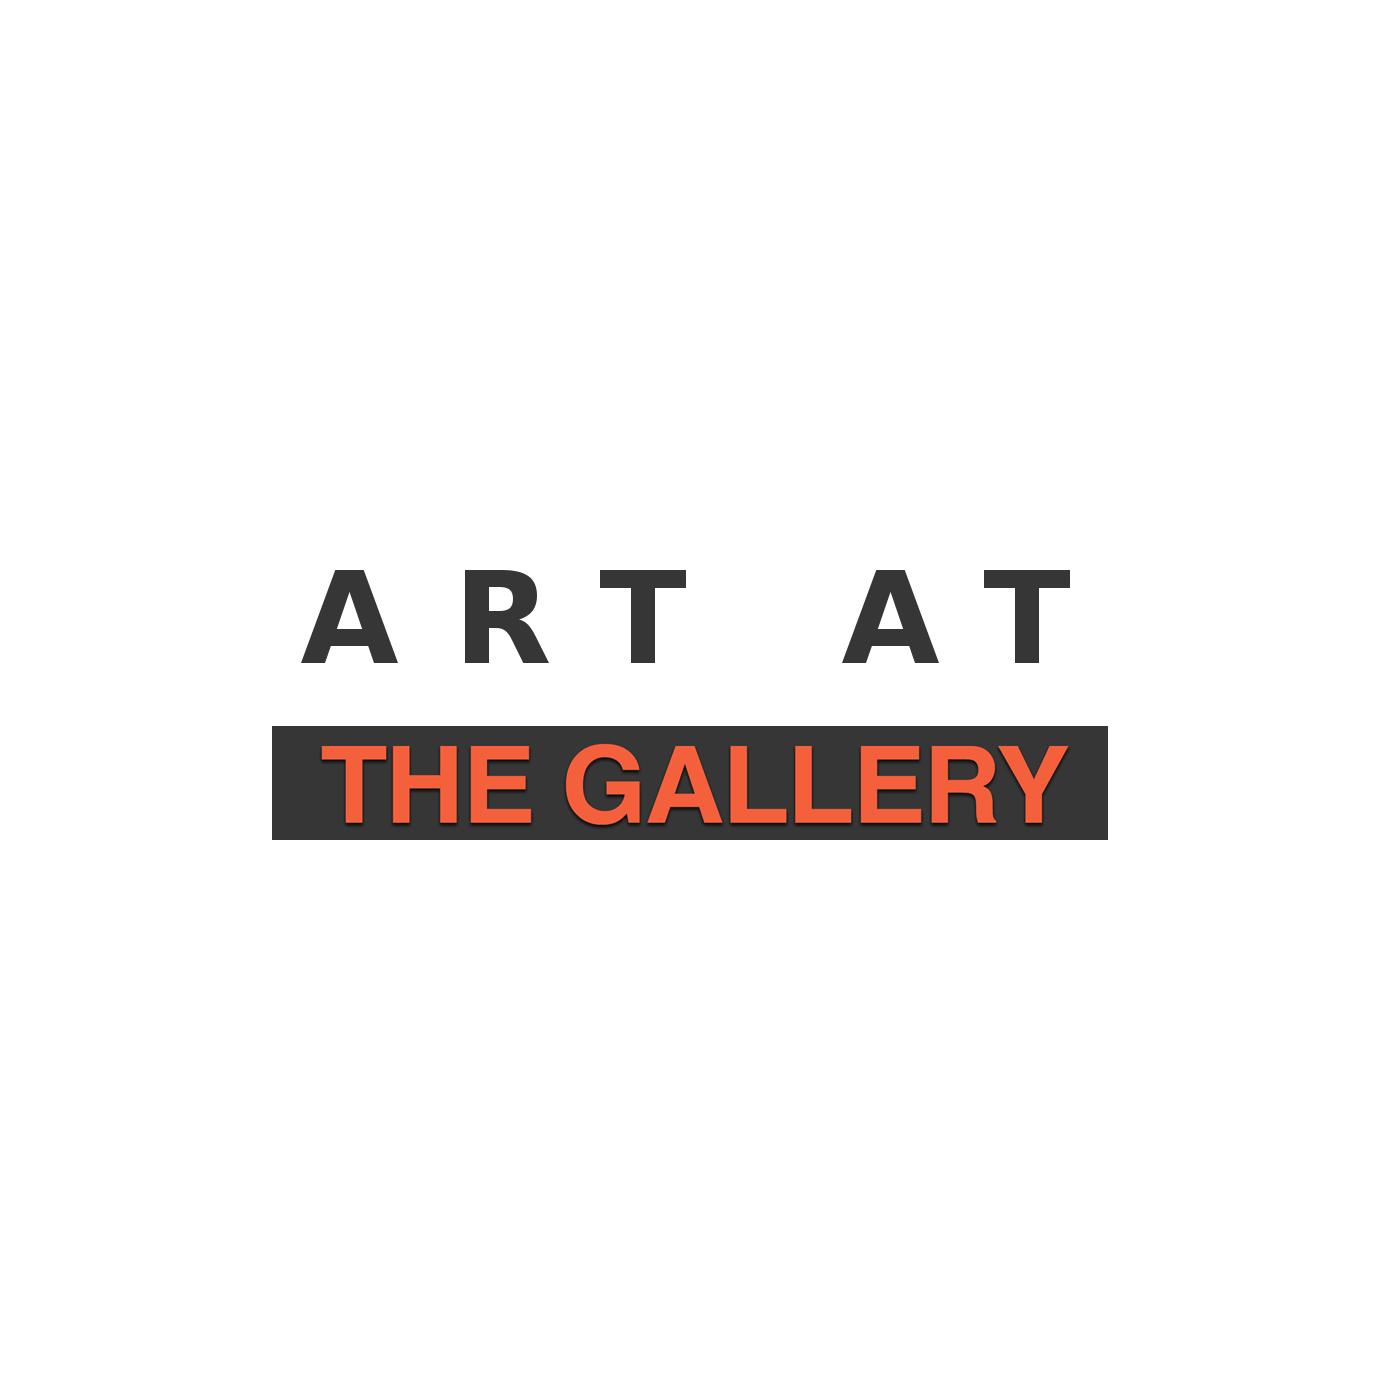 Venue: The Gallery